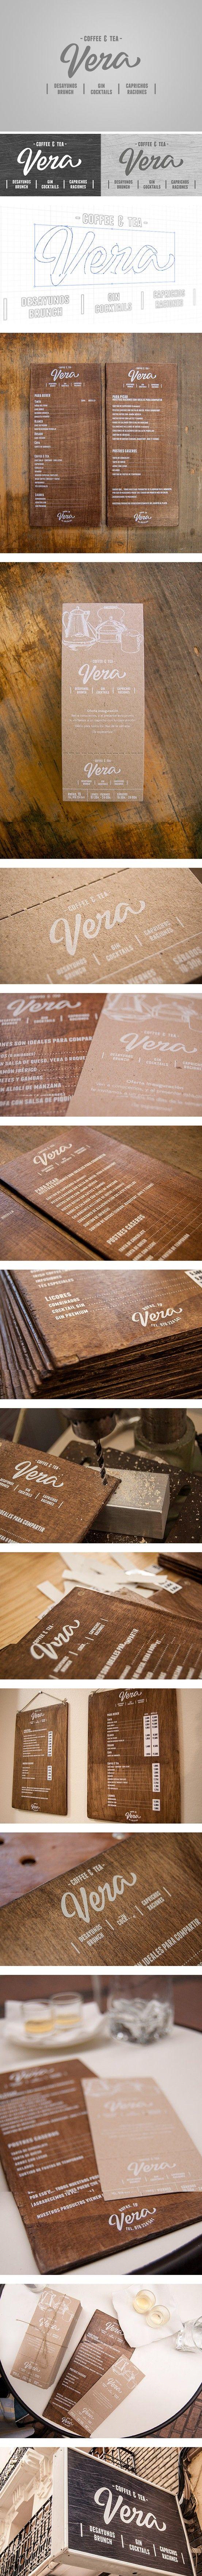 Vera | #stationary #corporate #design #corporatedesign #identity #branding